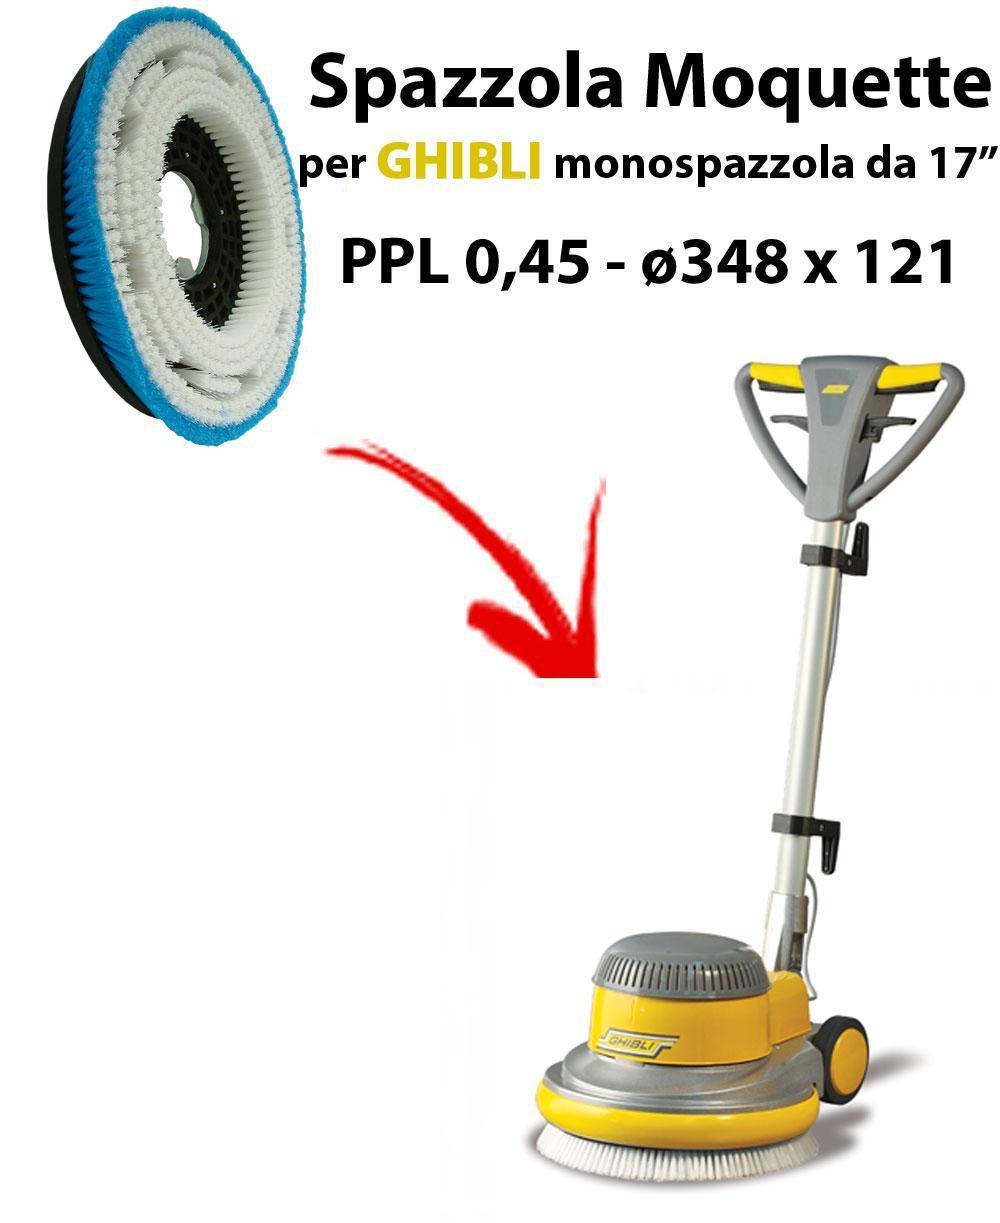 MOQUETTE BRUSH for scrubber dryer COMAC ABILA 45. Model: PPL 0,45 C/FLANGIA ⌀348 X 121